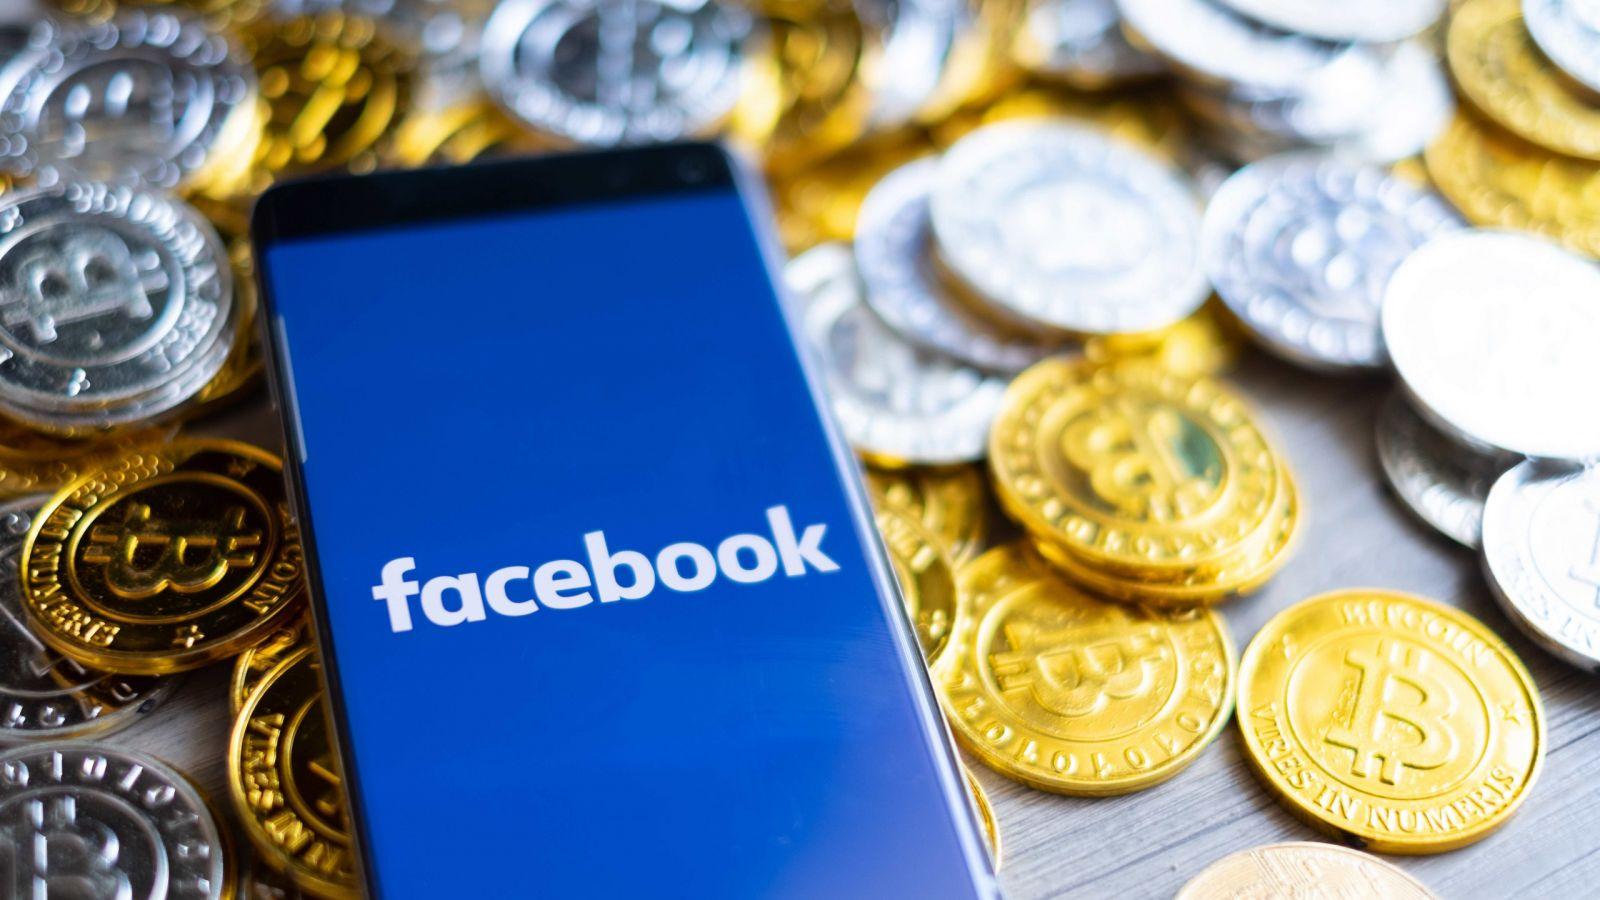 Facebook: Θέλετε να γίνεται εκατομμυριούχος; – Η εταιρεία προσφέρει τεράστια χρηματικά ποσά για να ανταγωνιστεί το TikTok